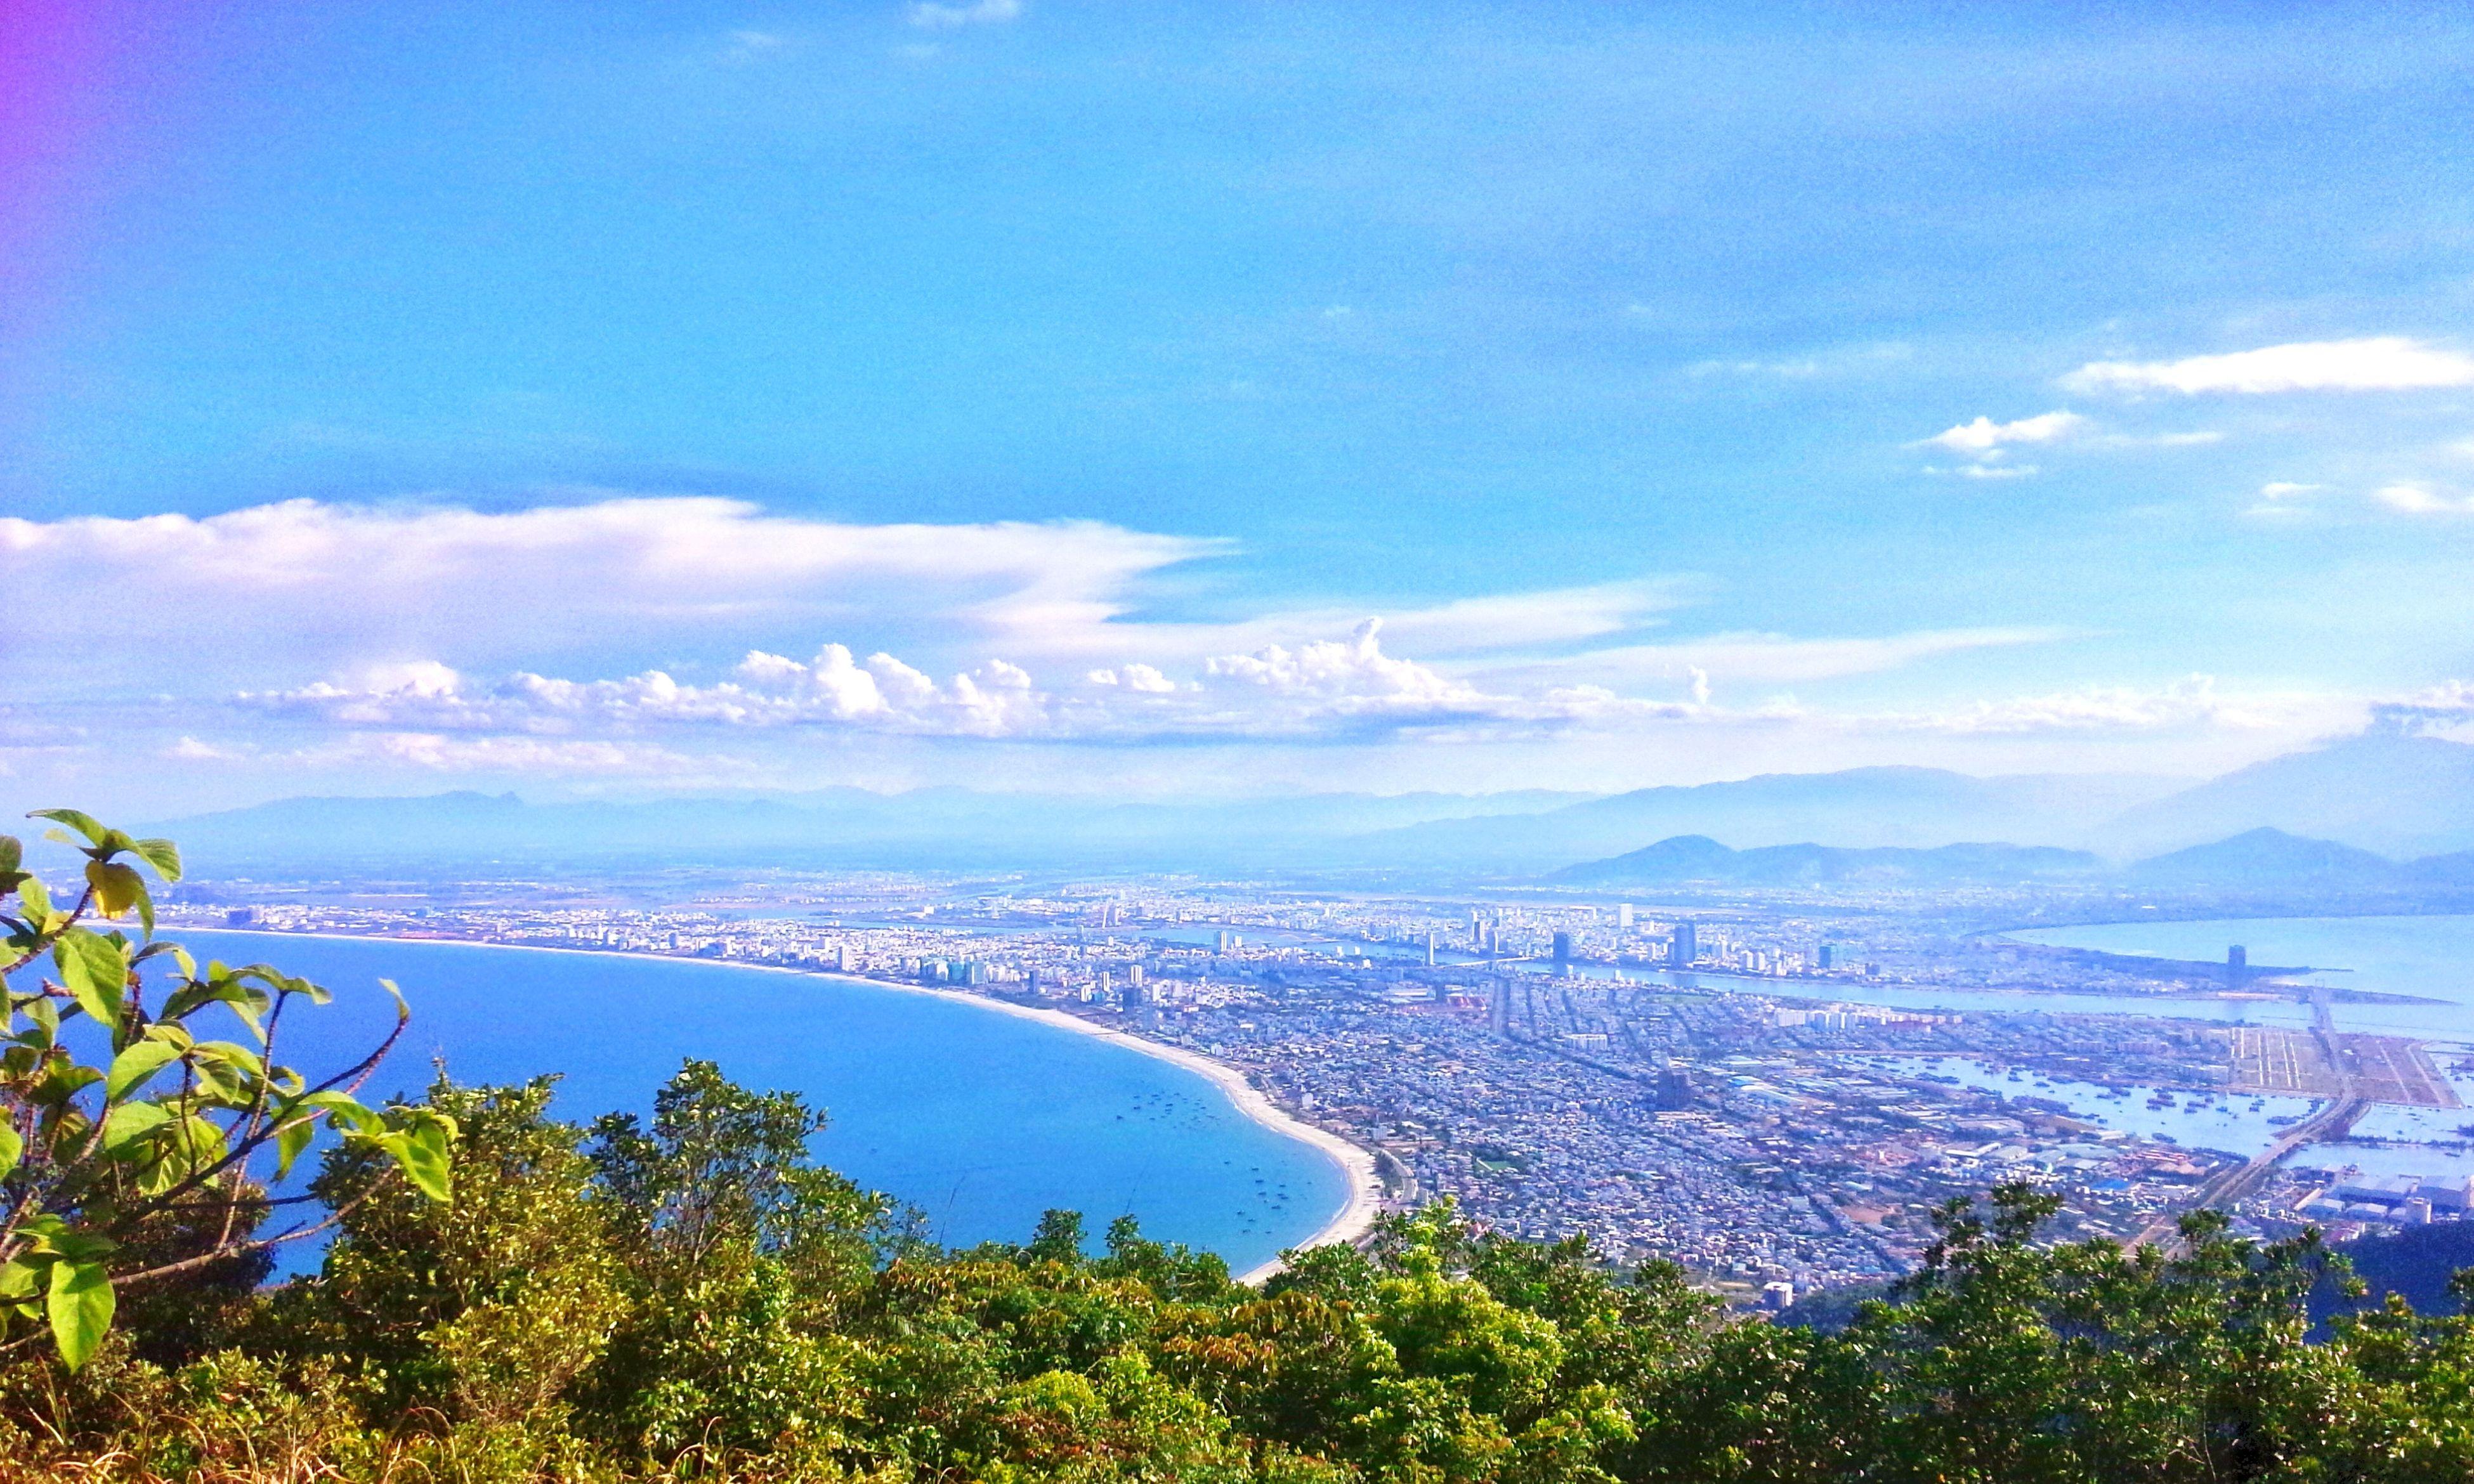 Battle Of The Cities Son Tra's Peninsula Da Nang, Vietnam Da Nang From High Coastline Beauty In Nature My Best Photo 2016😊